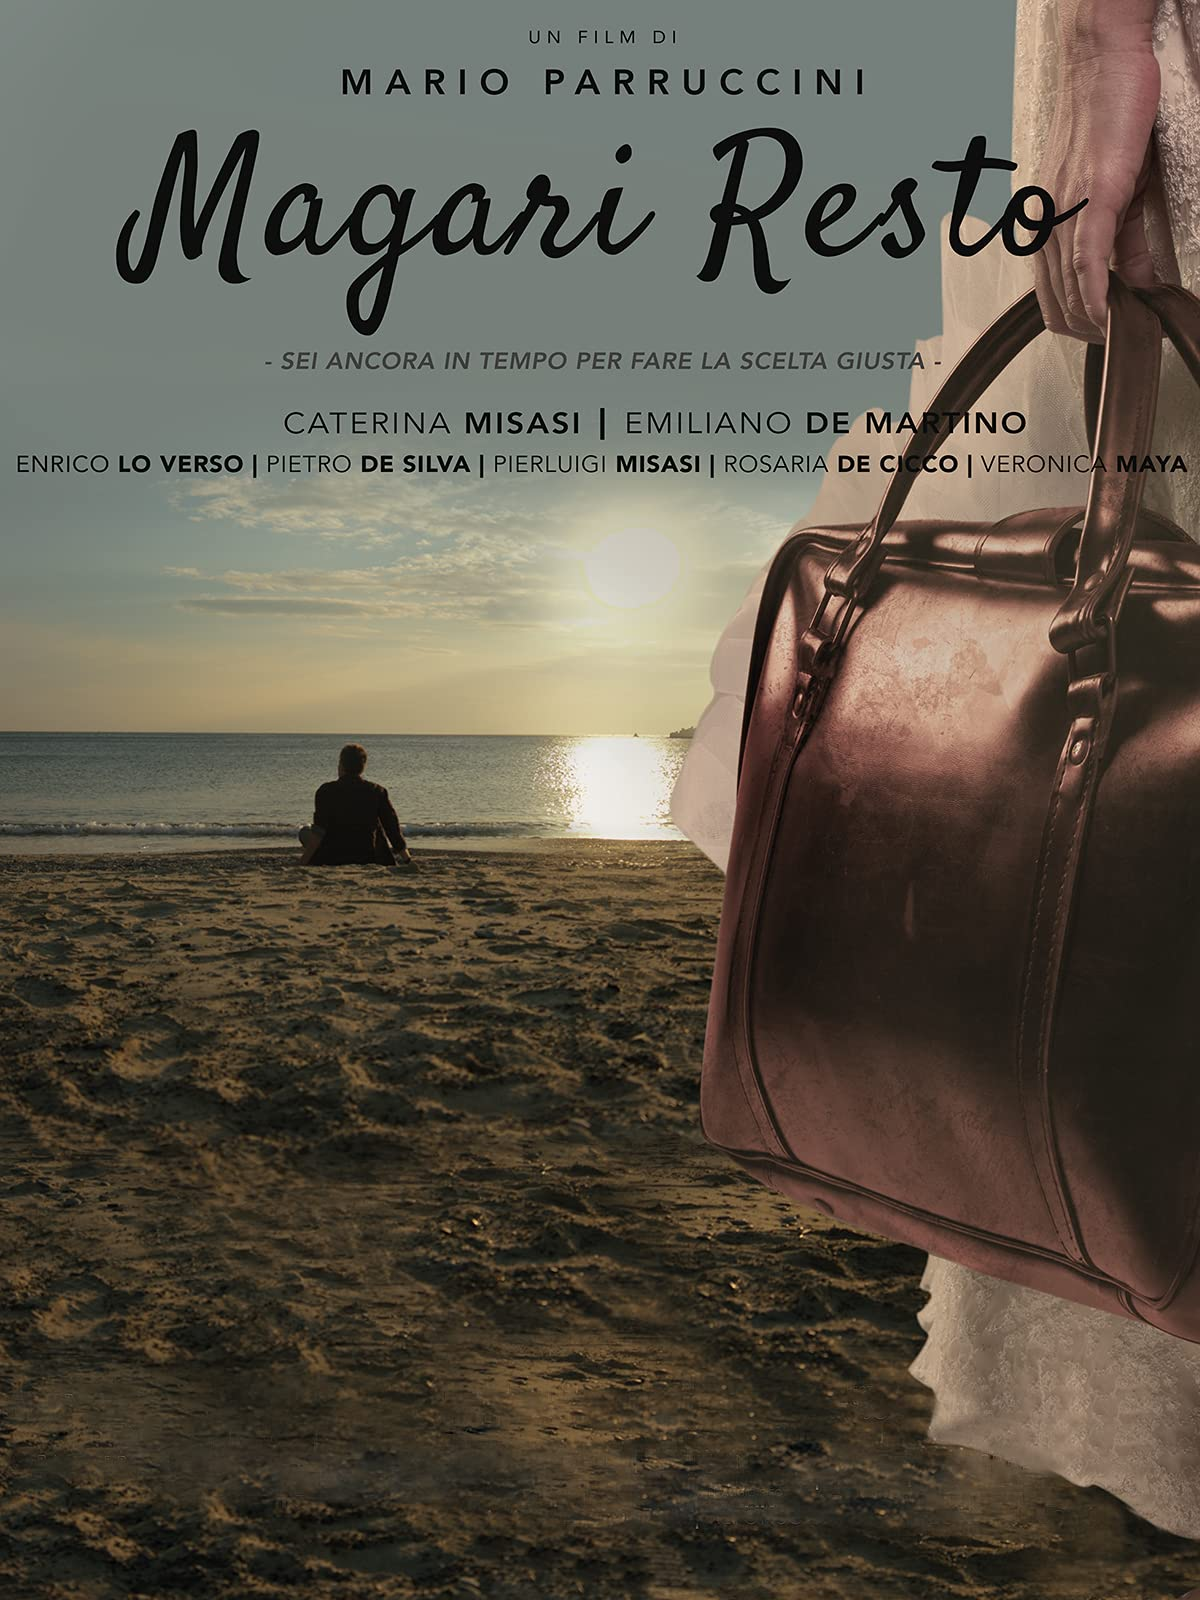 Magari resto (Maybe I'll stay)